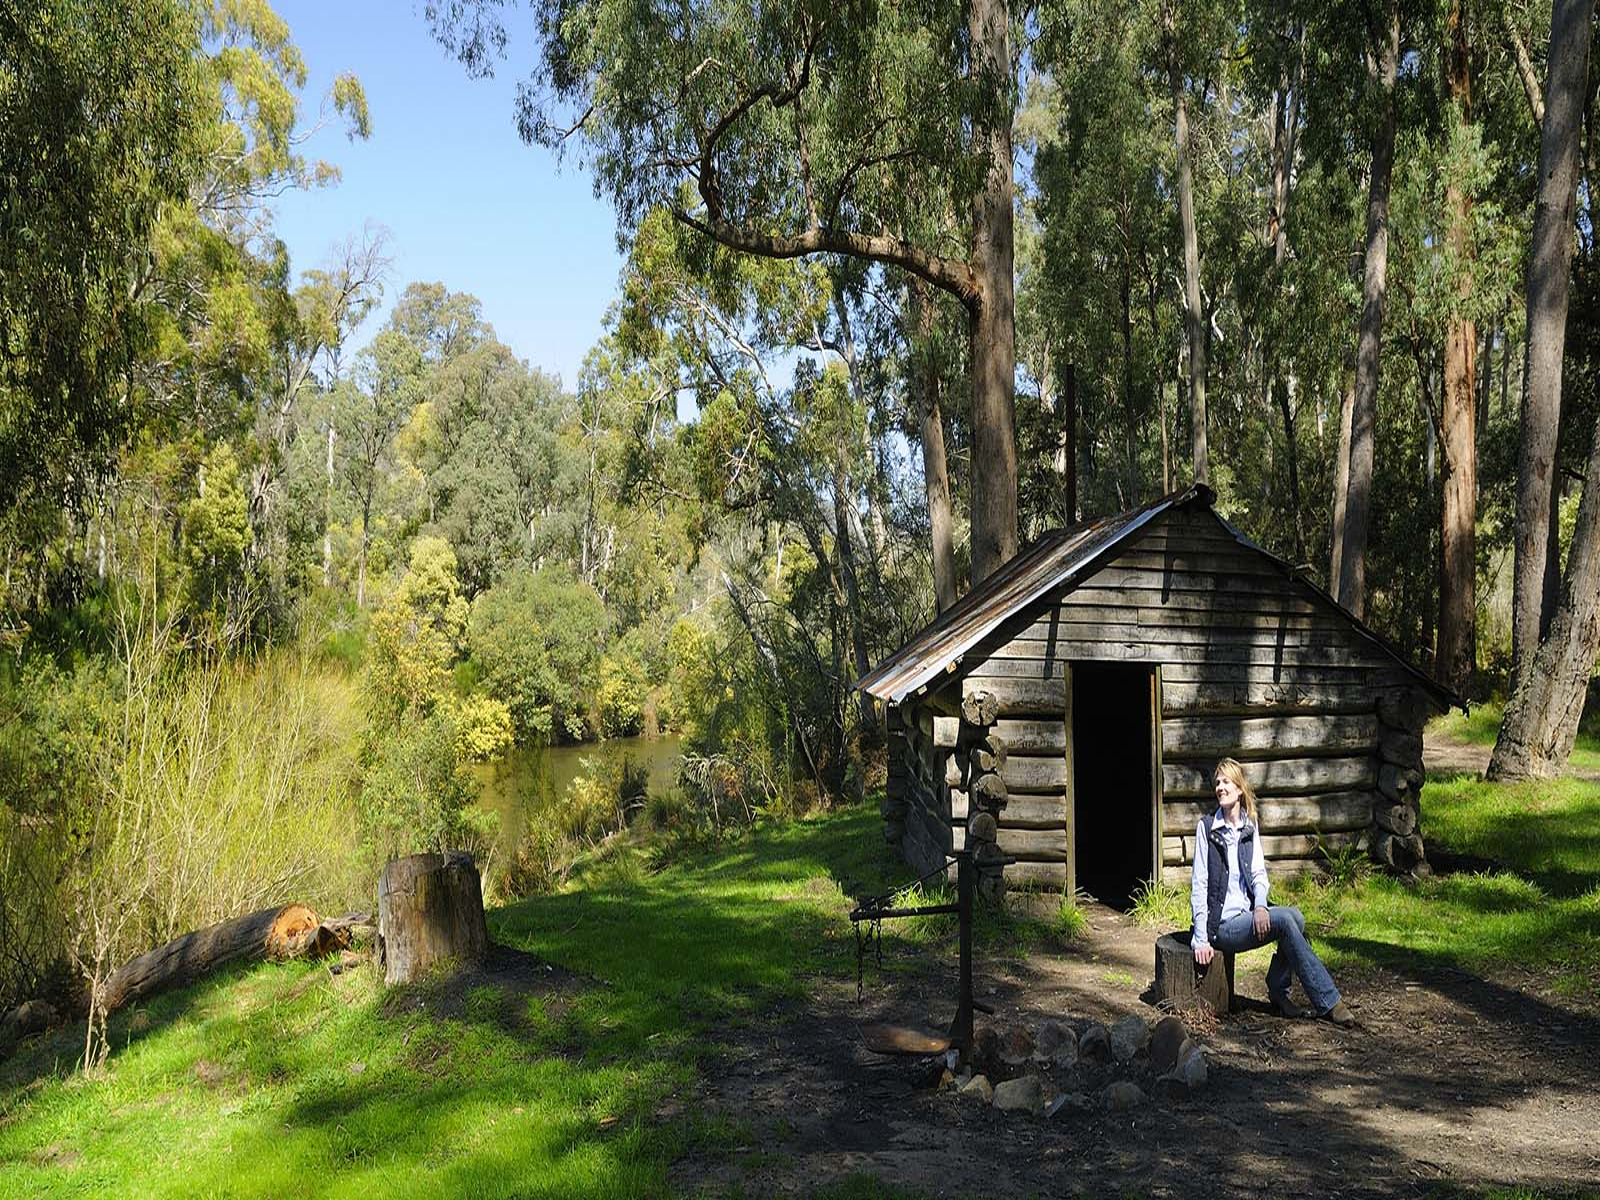 Omeo, Gippsland, Victoria, Australia